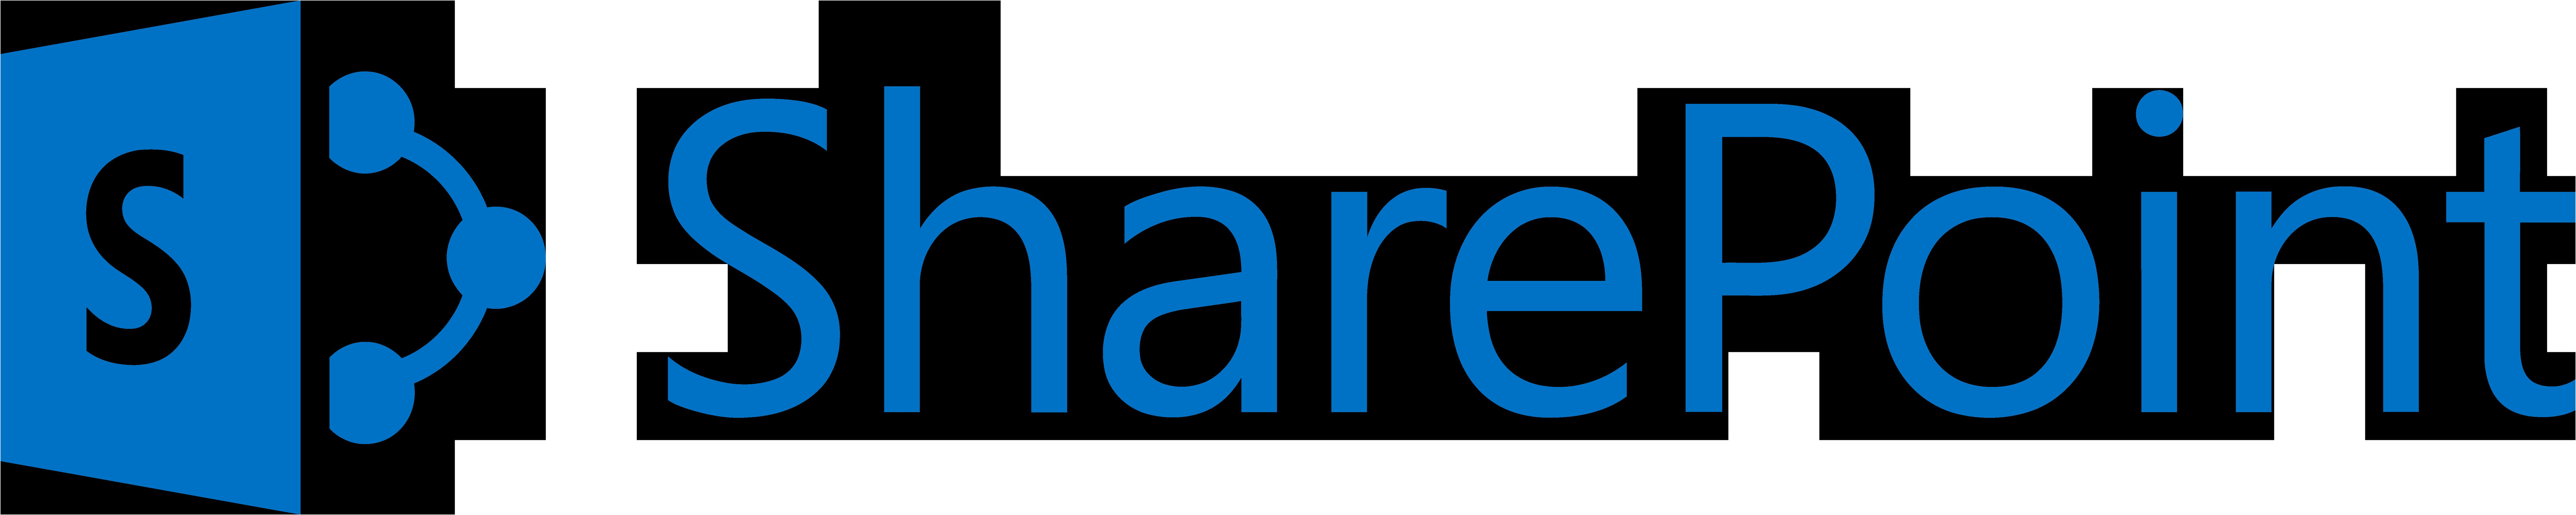 sharepoint-1